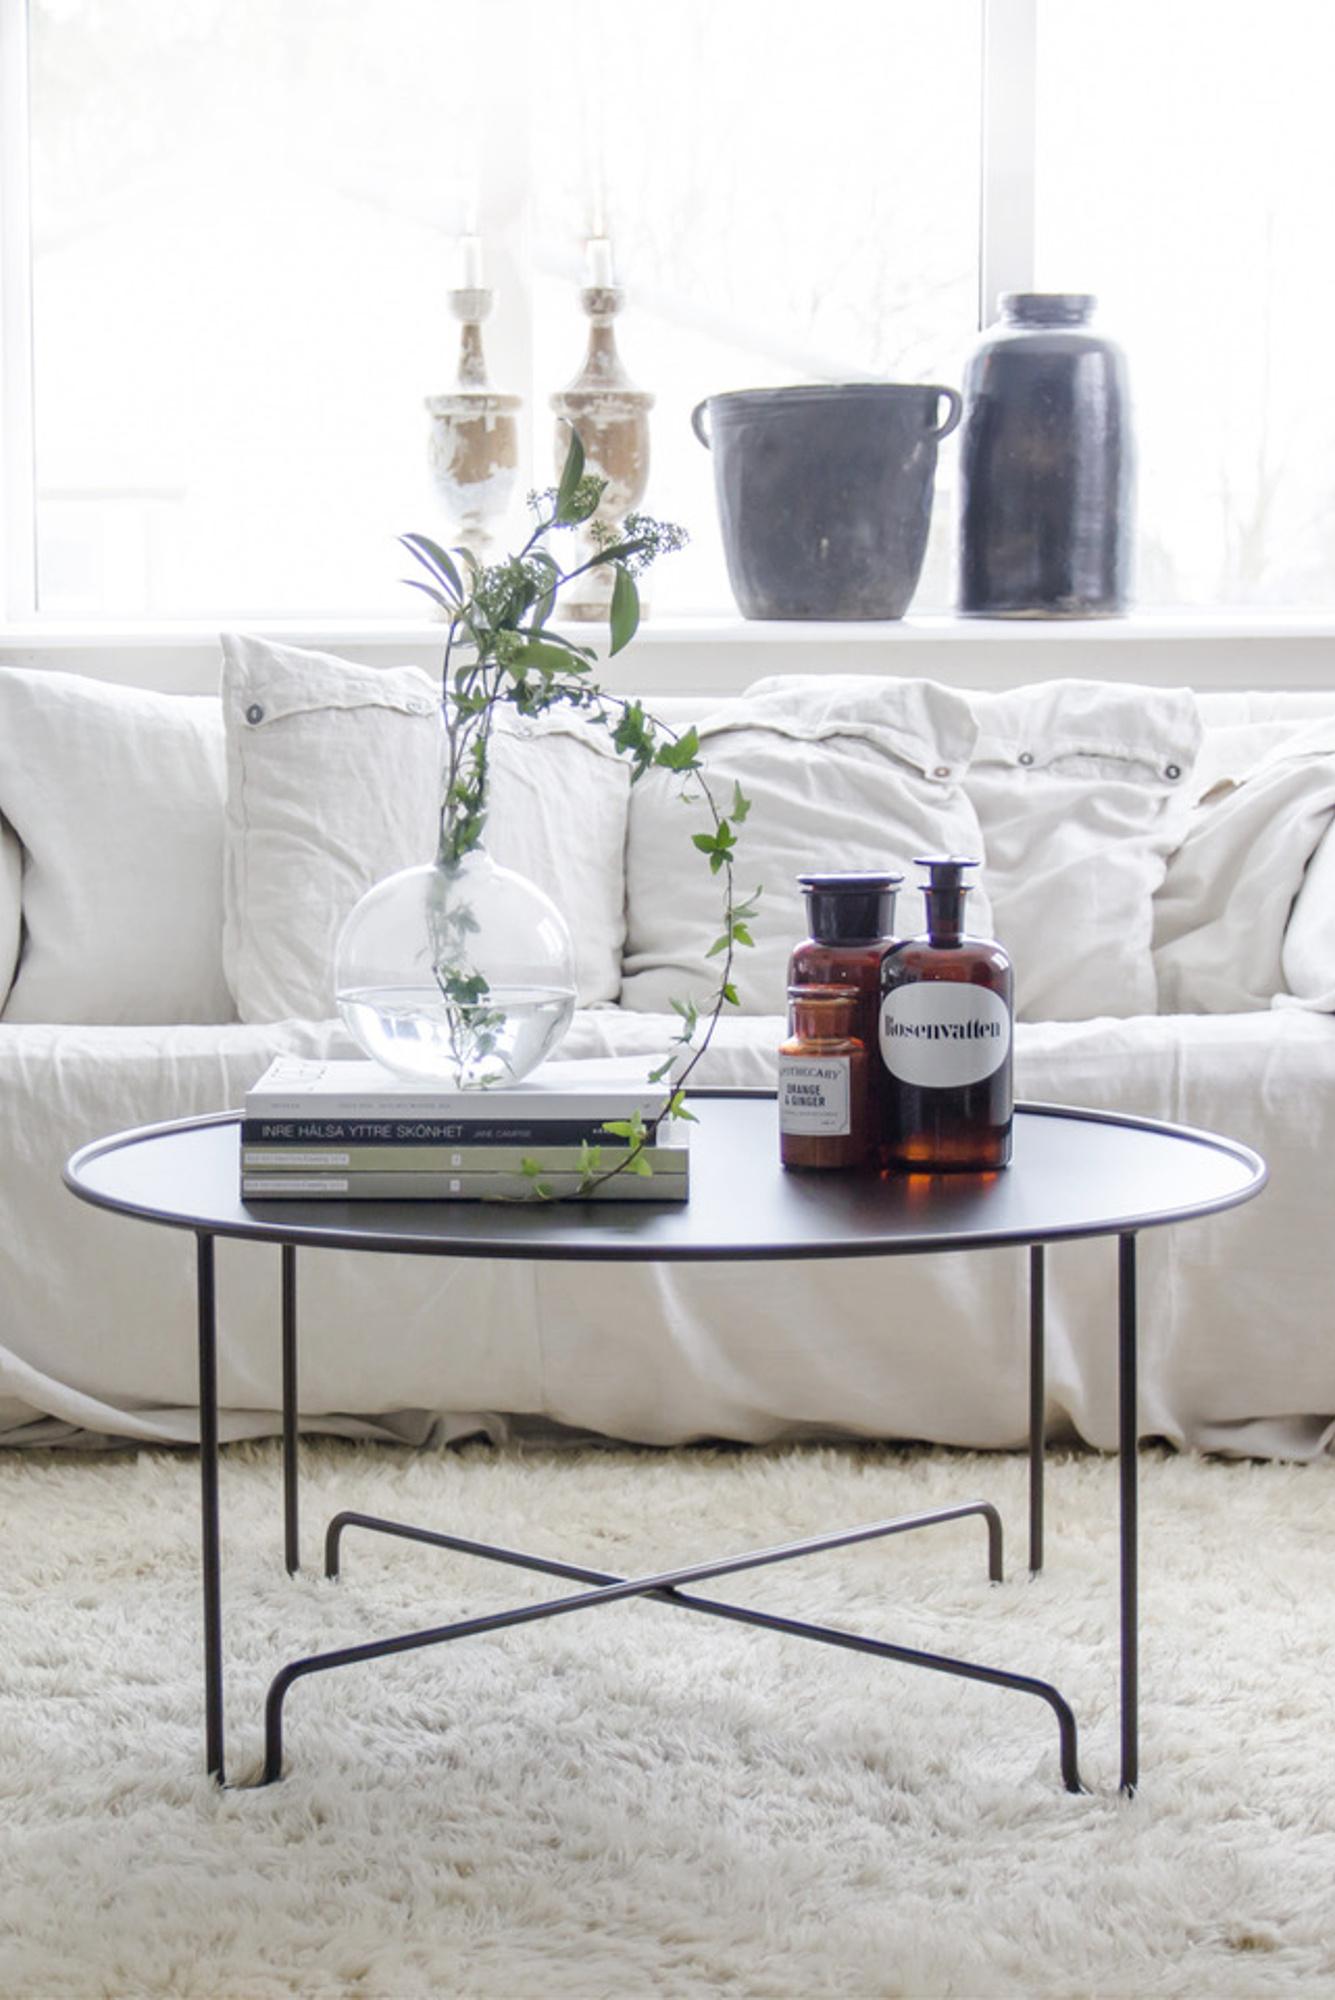 Ek Coco Oakamp; Caroline Globe Furniture CoDesigner Sofa Table stBrxQdCh